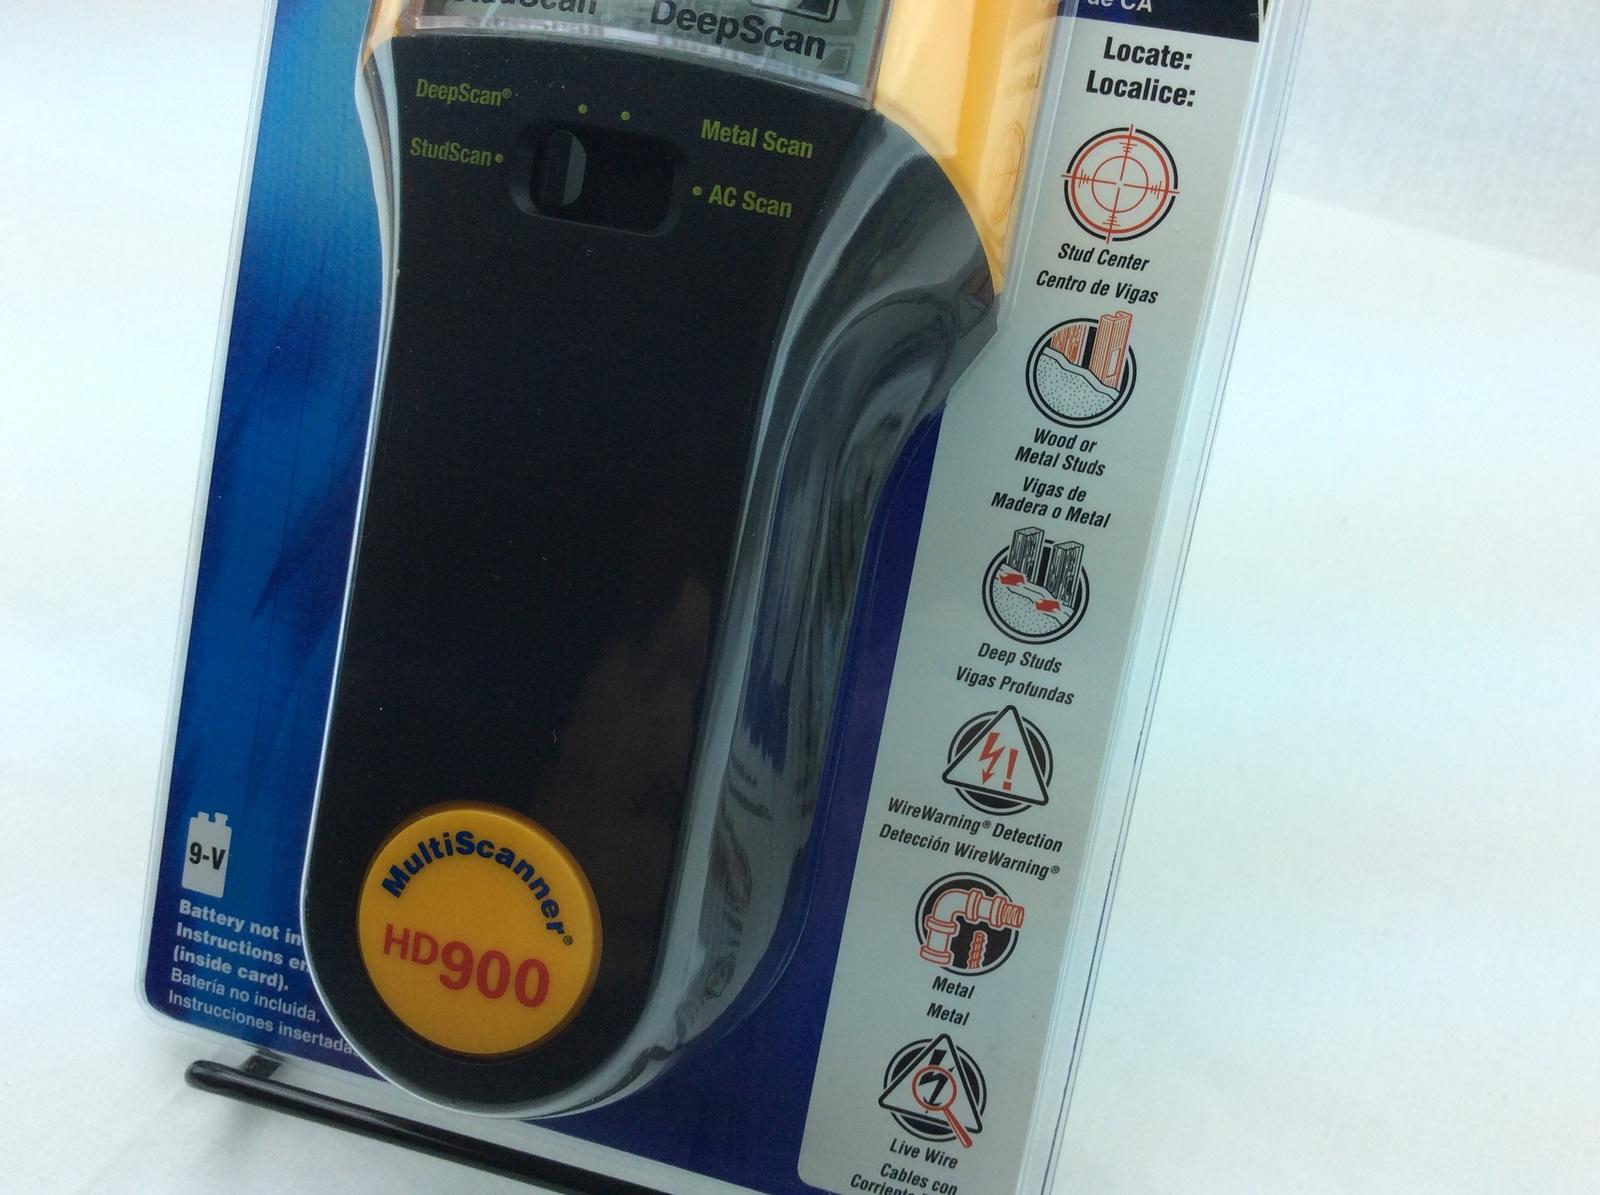 Zircon Electronic Stud Sensor HD900 Stud Finder Multi Scanner